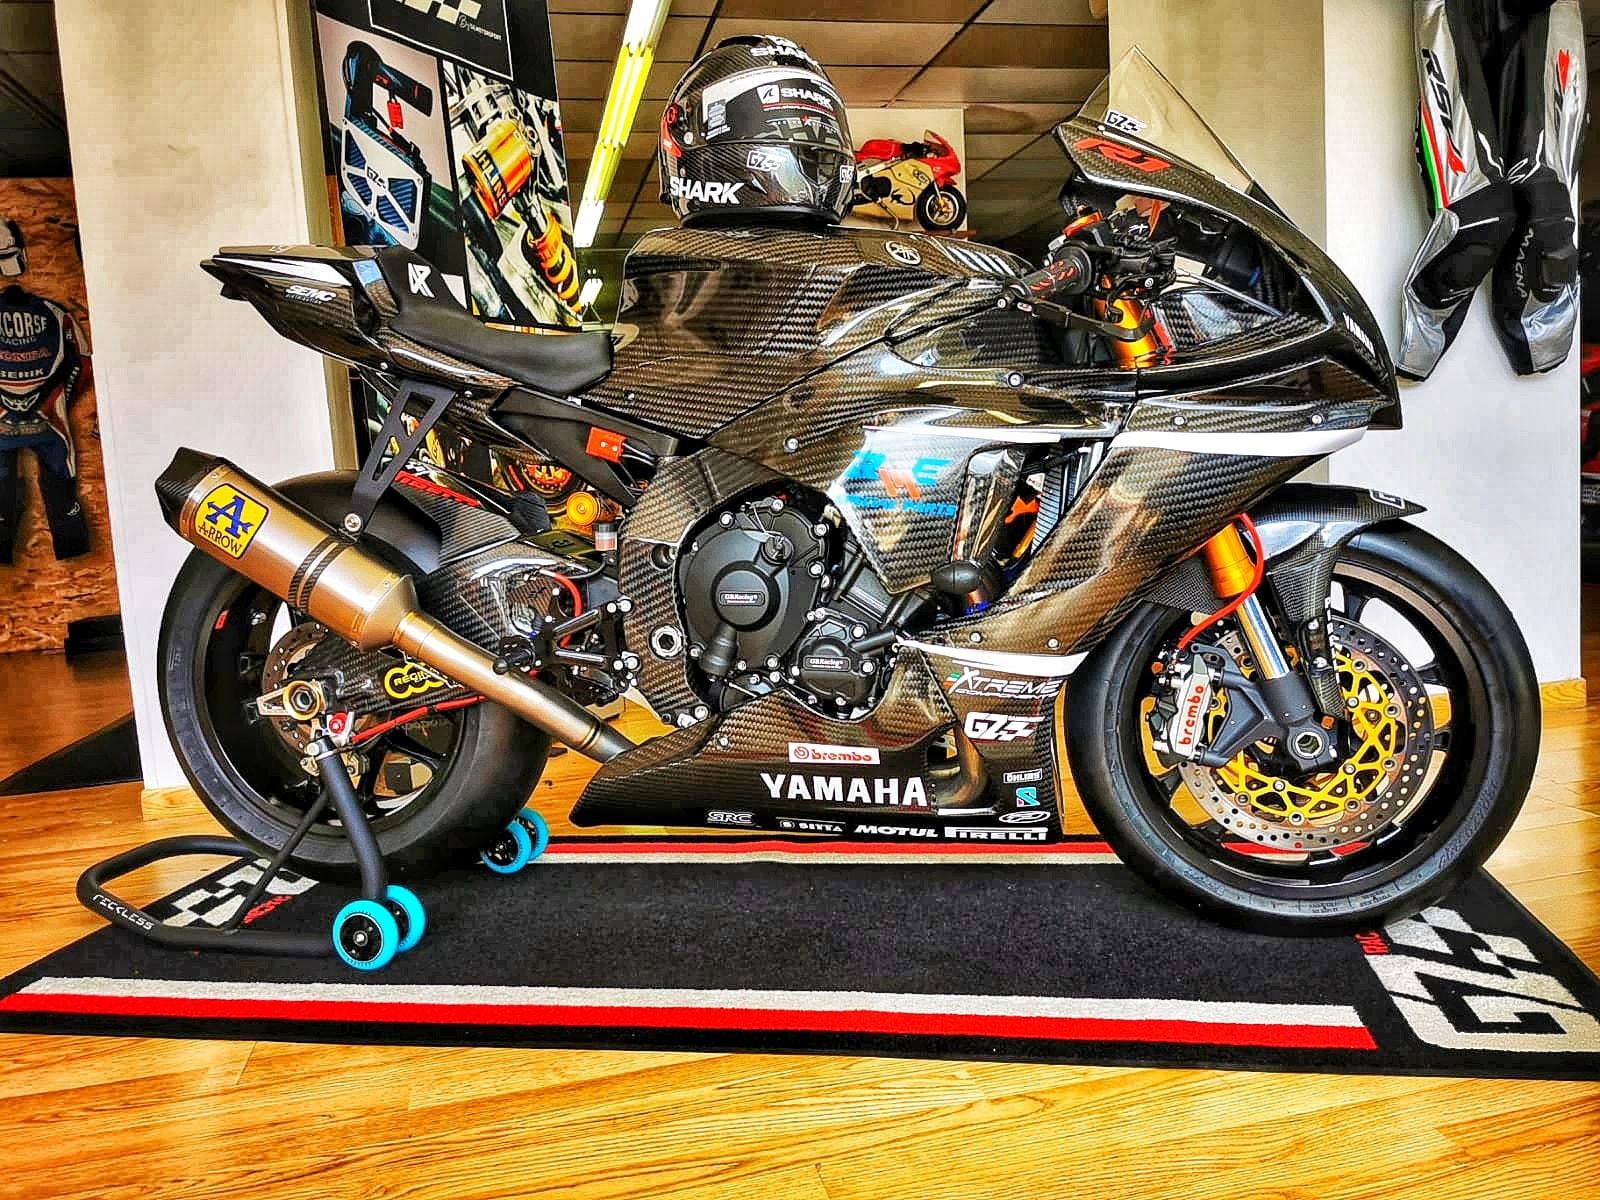 Yamaha R1 et R1M  Crossplane 2015 ( sujet numero3 ) - Page 12 11815910